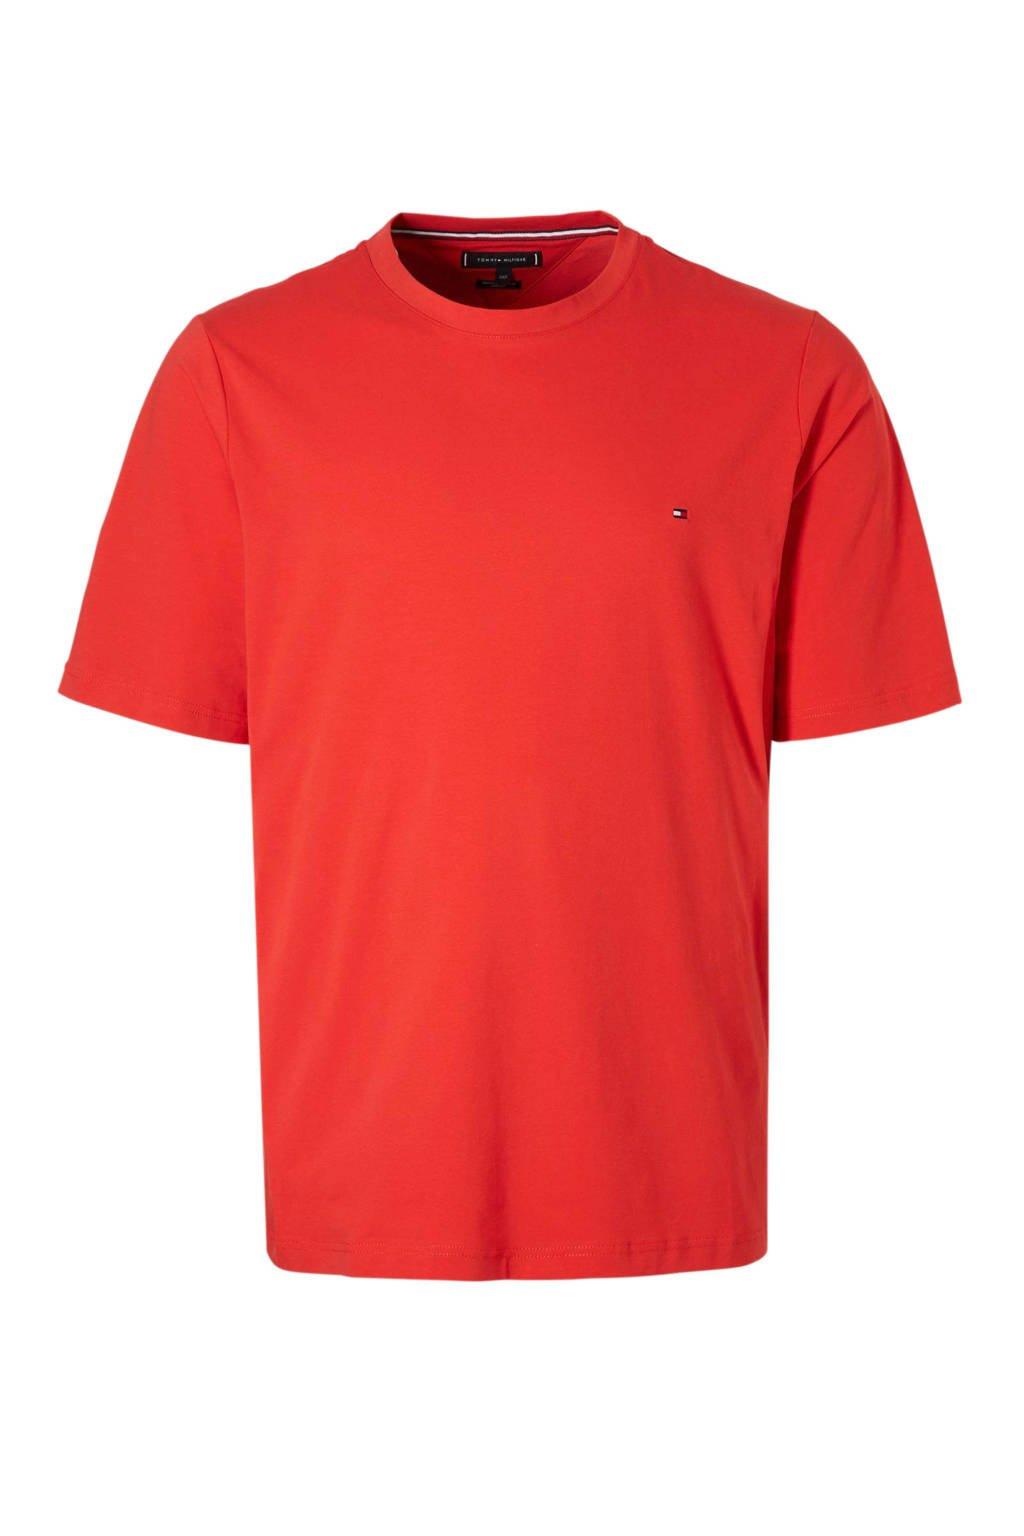 Tommy Hilfiger Big & Tall +size T-shirt met logo, Rood